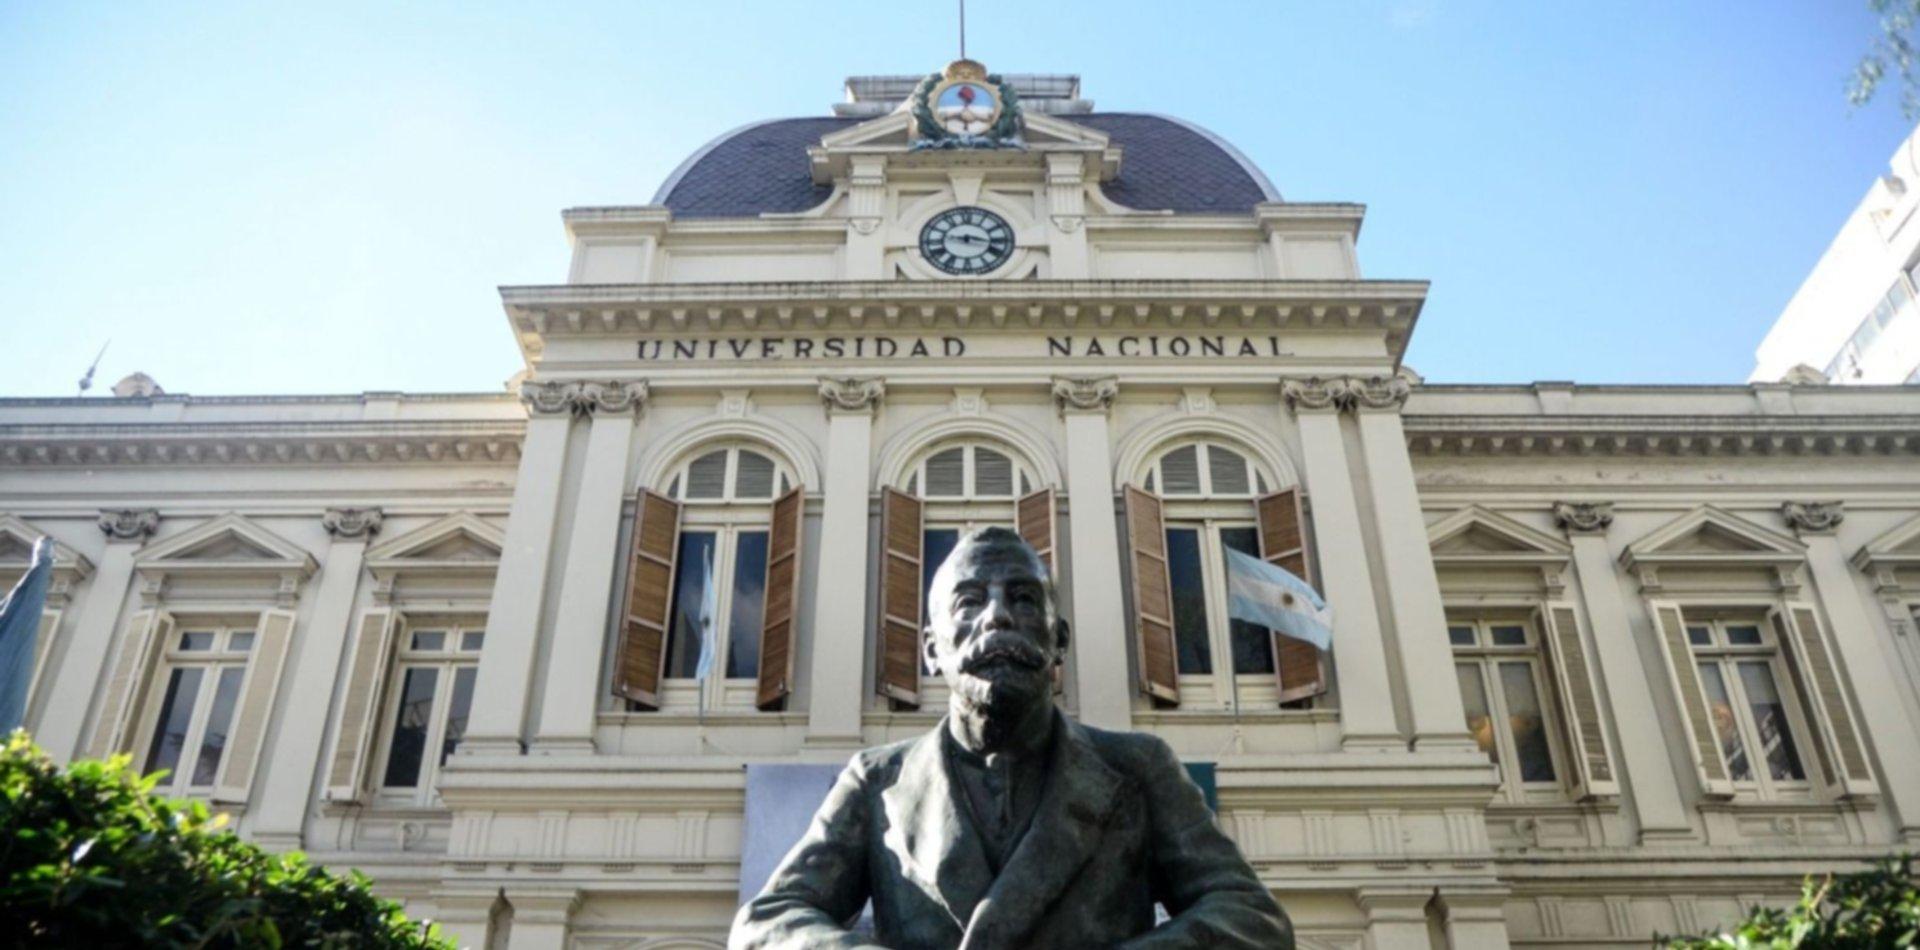 Un ranking ubicó a la UNLP entre las tres mejores Universidades de América Latina